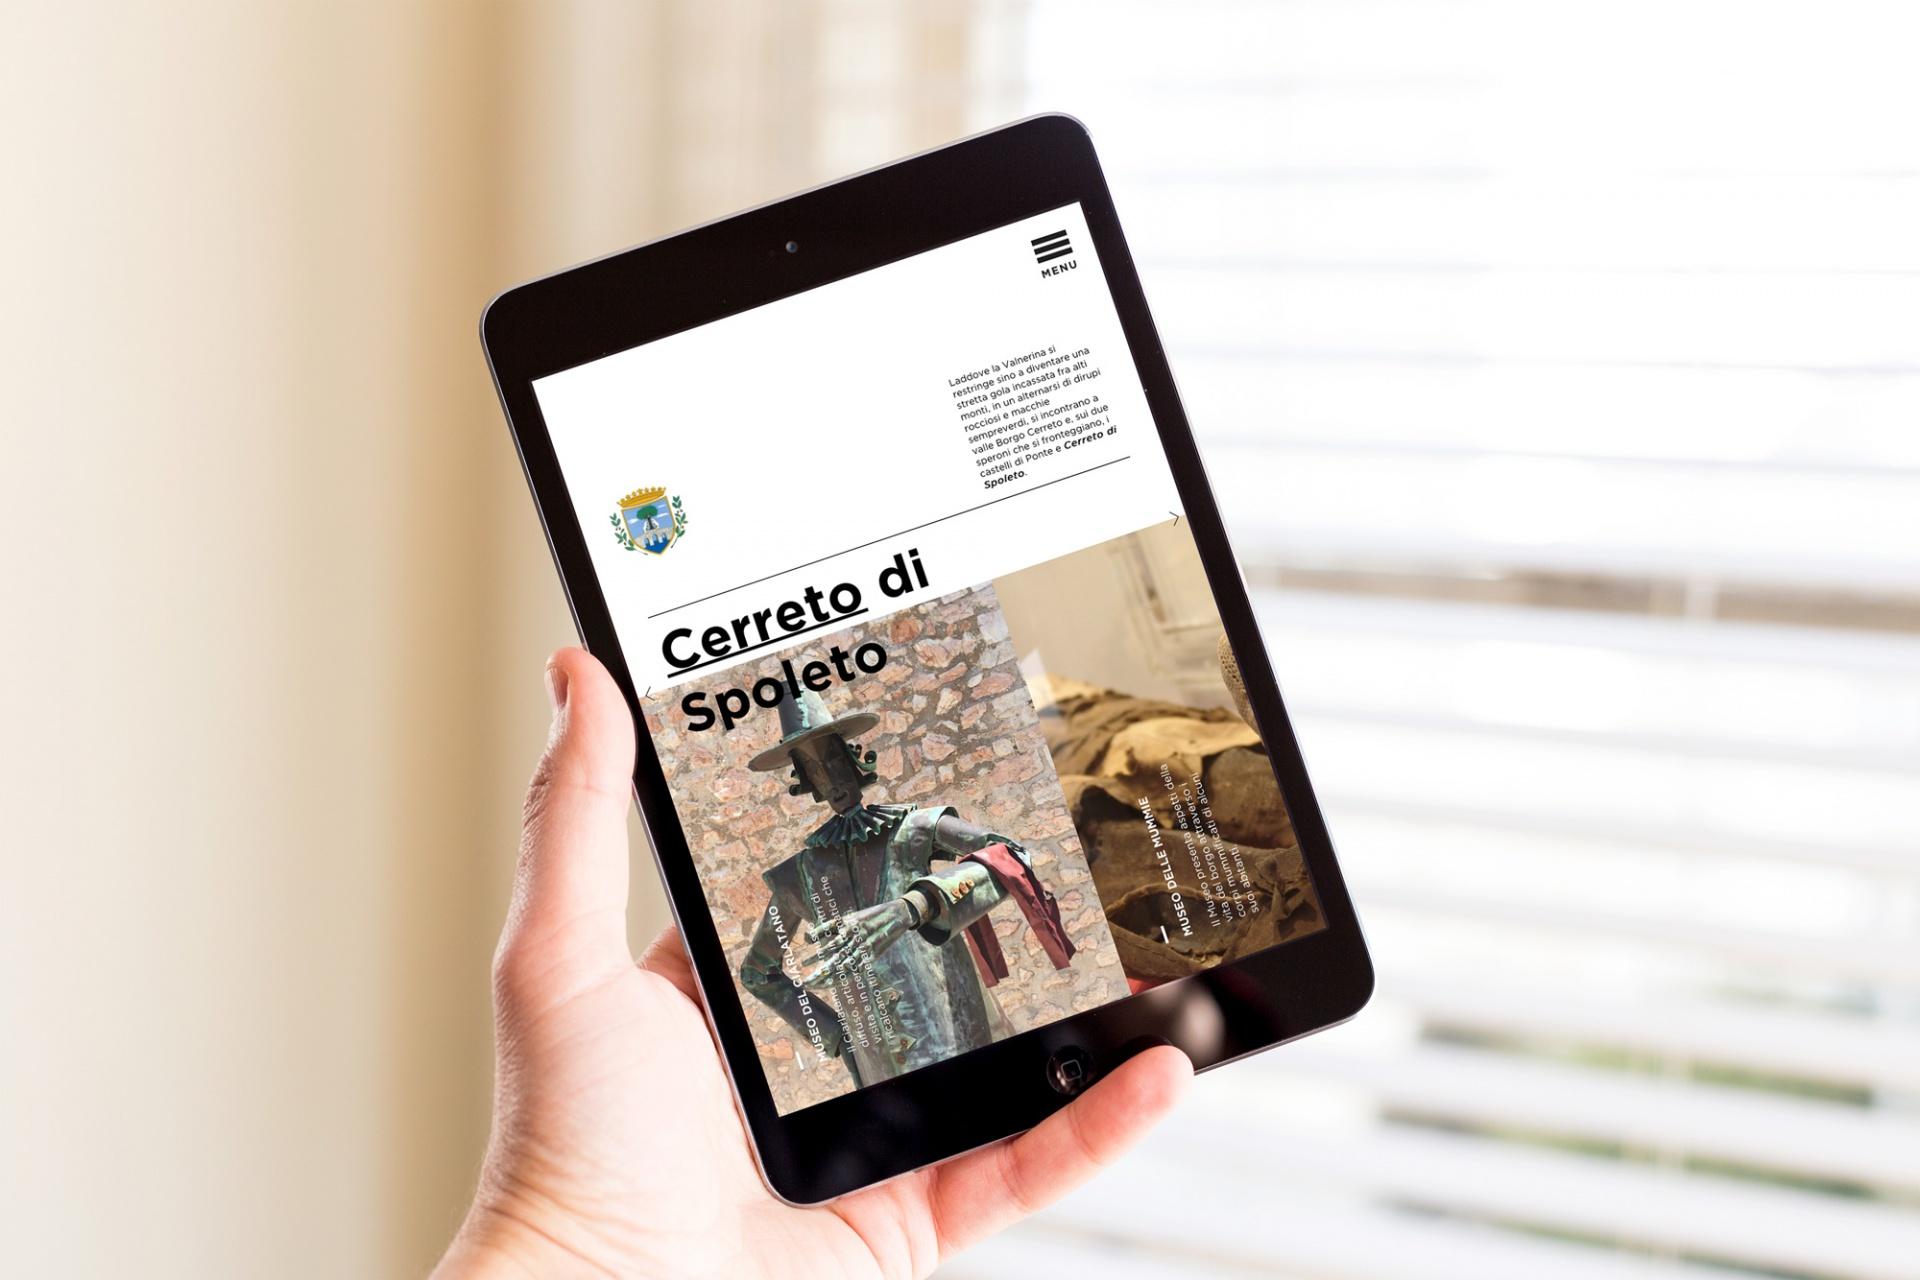 iBeacon perugia app | Audiogiude musei